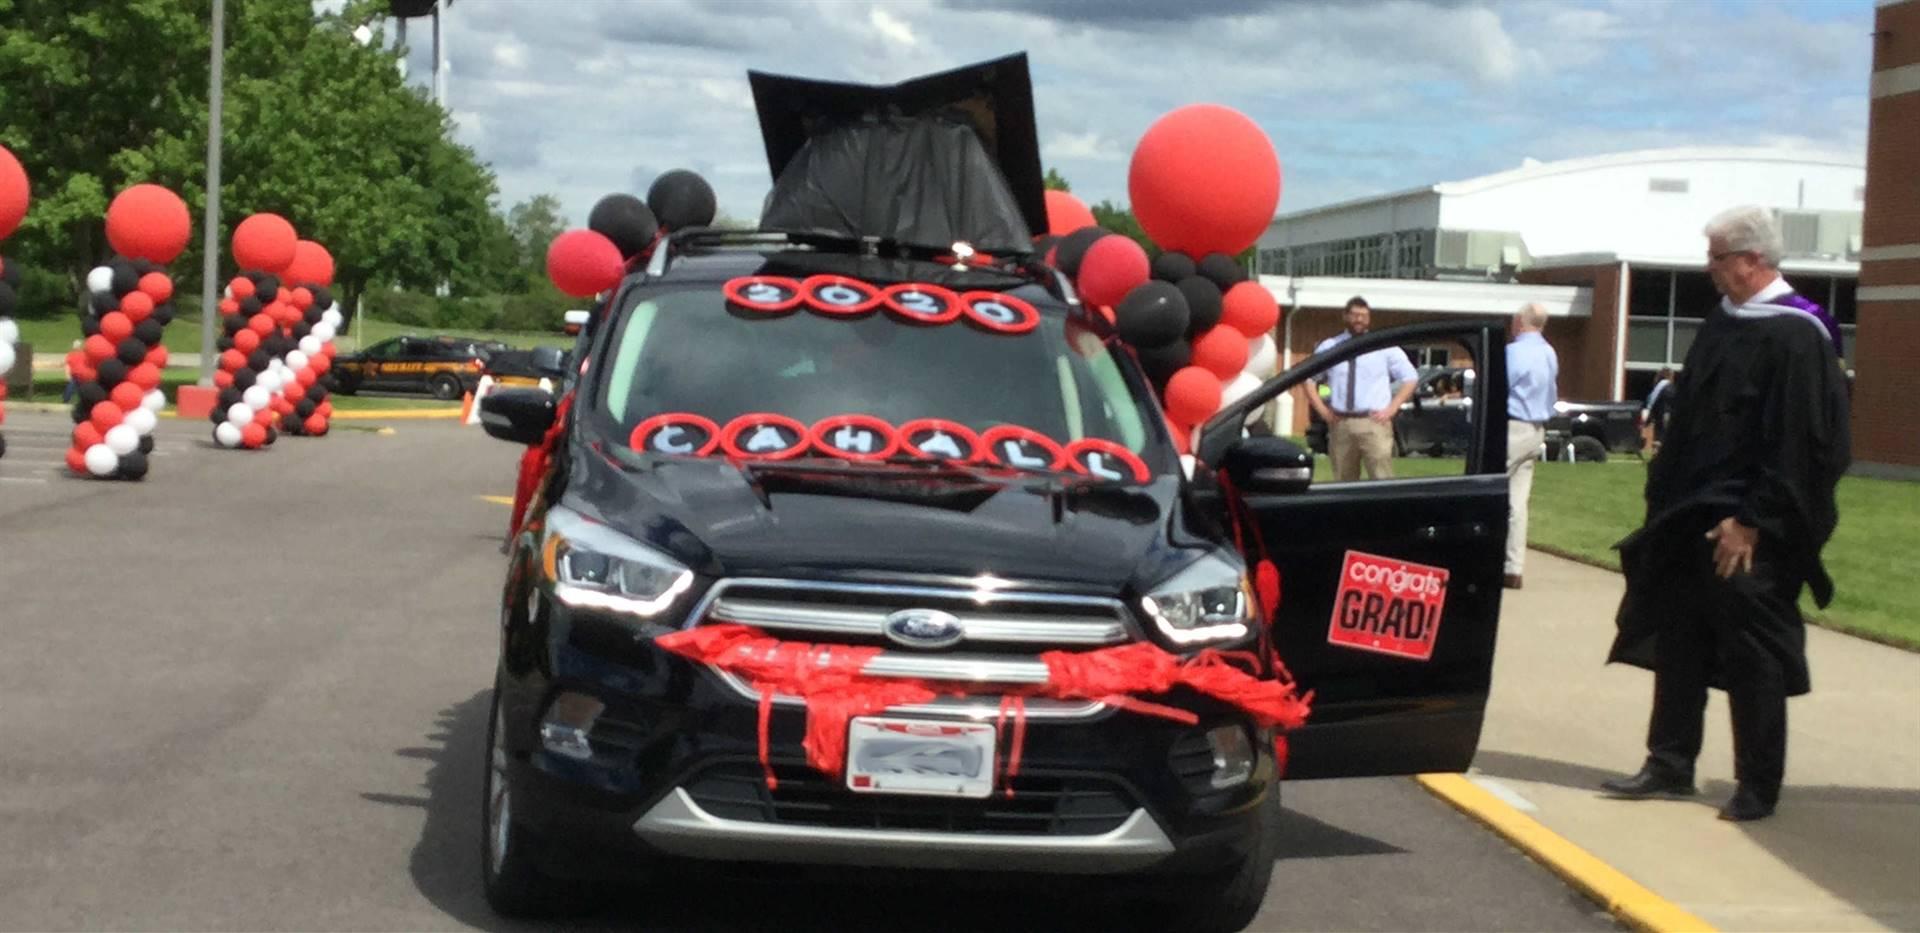 Graduation decorated car